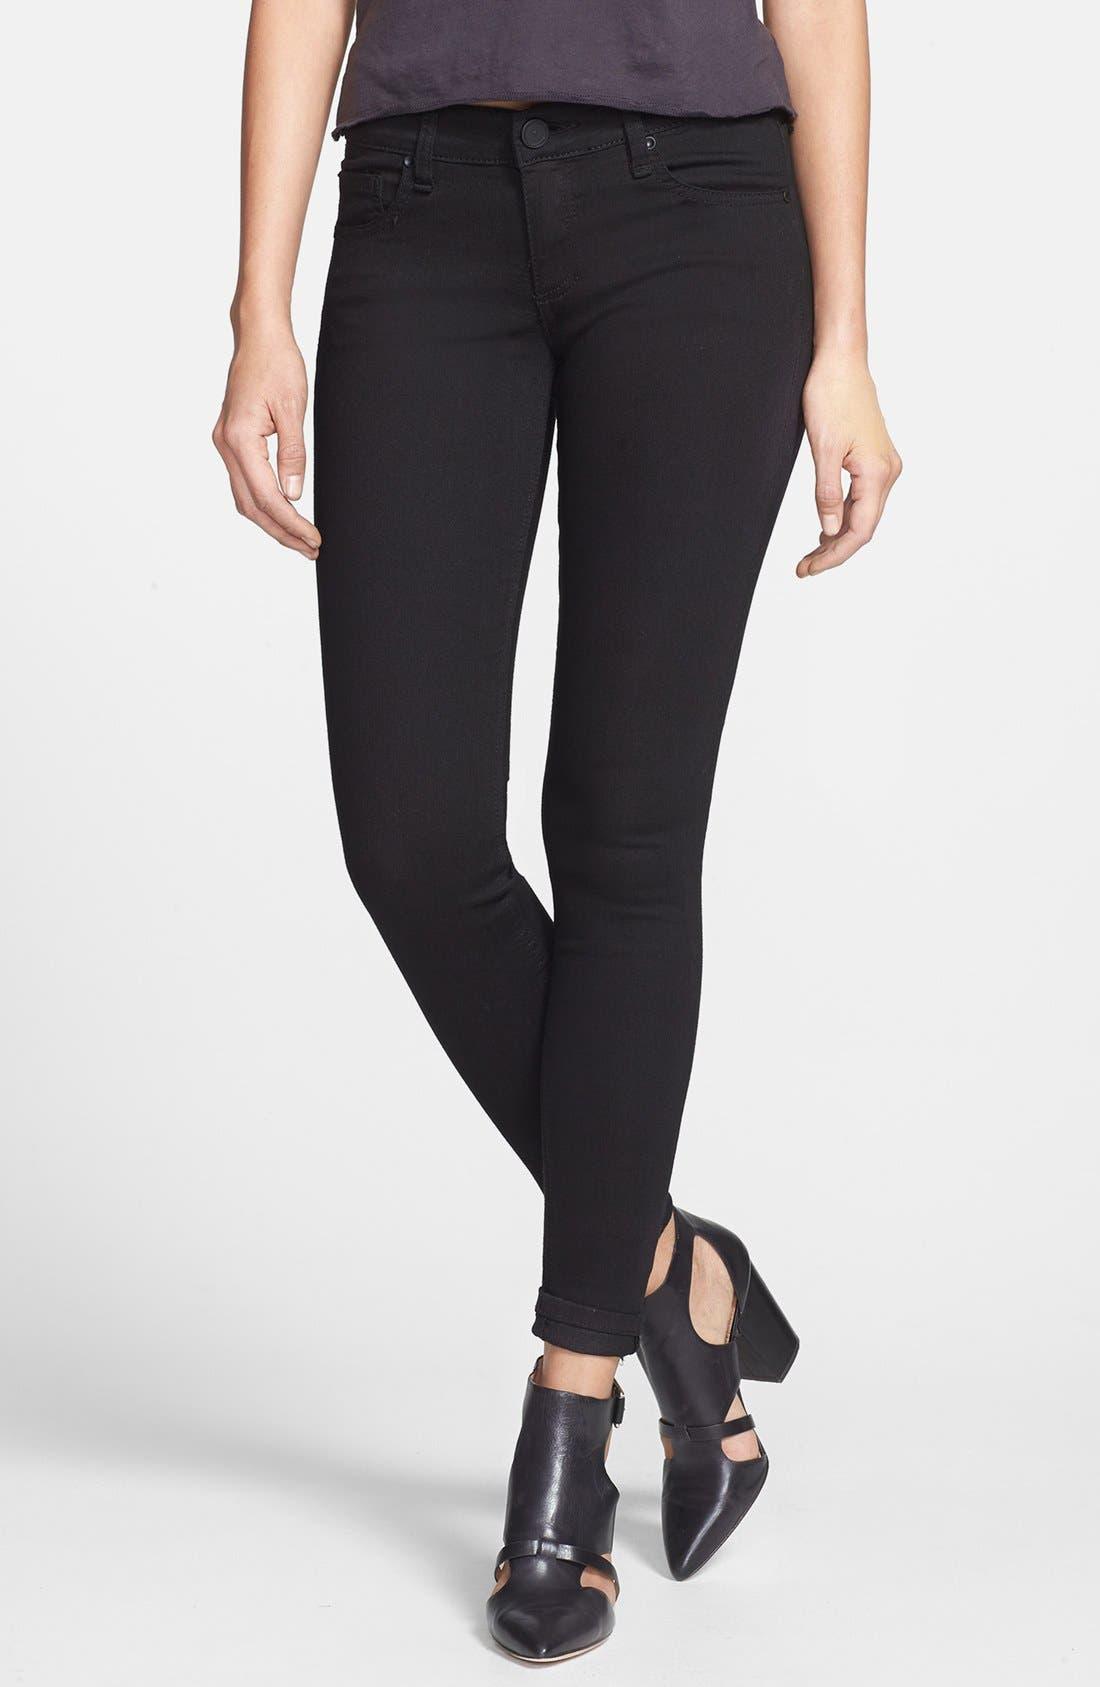 'Sloan' Skinny Jeans,                             Main thumbnail 1, color,                             001